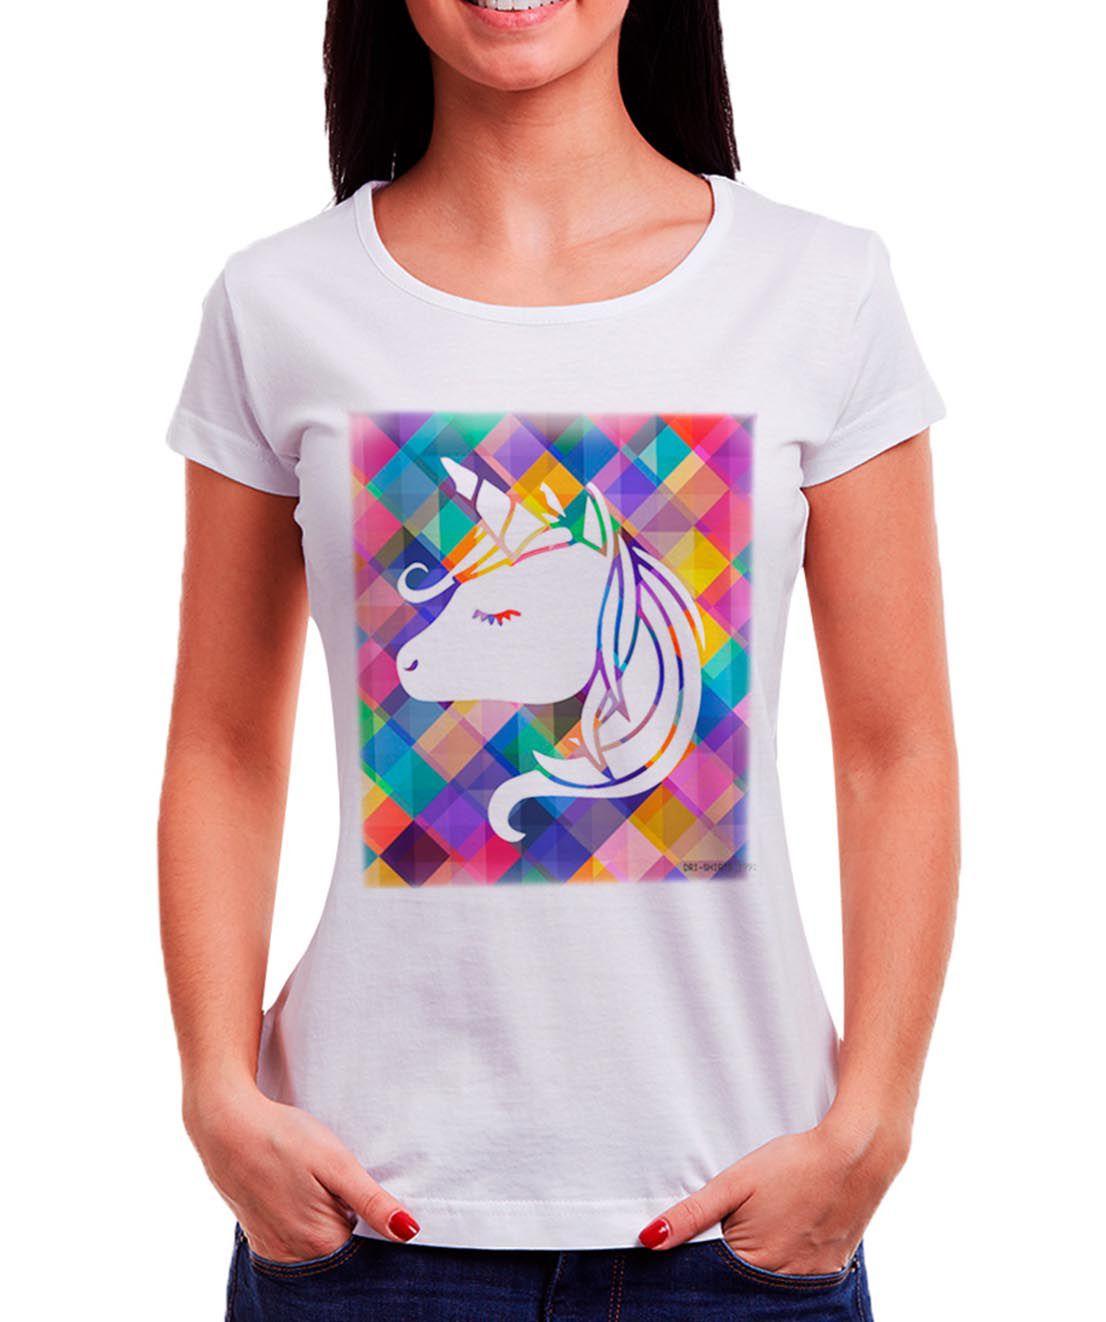 Blusa OutletDri T-Shirt Estampada Unicórnio Animado Branca